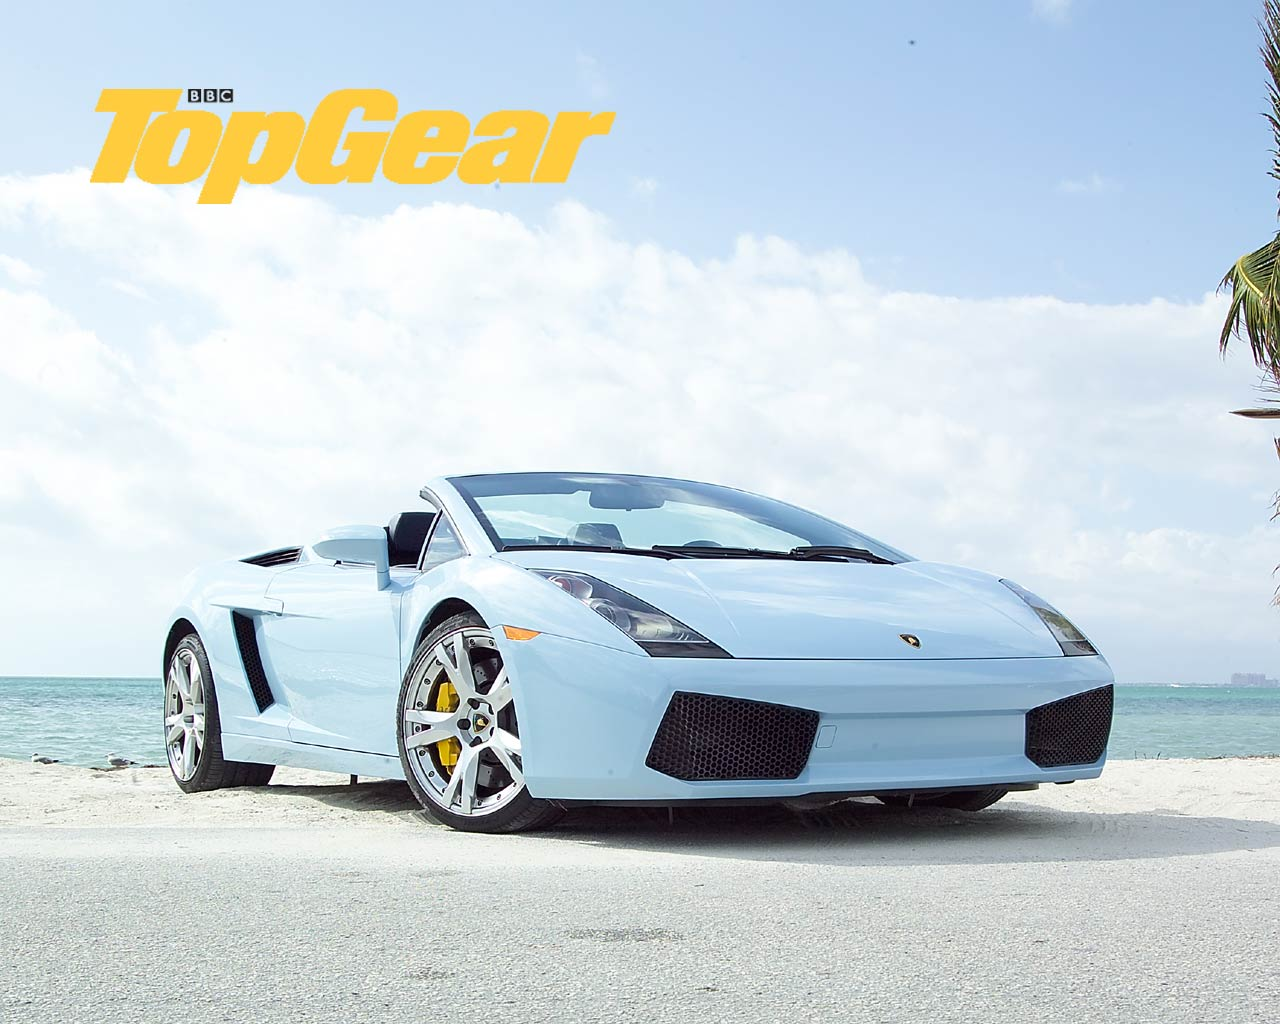 Charming Lamborghini Gallardo Spyder